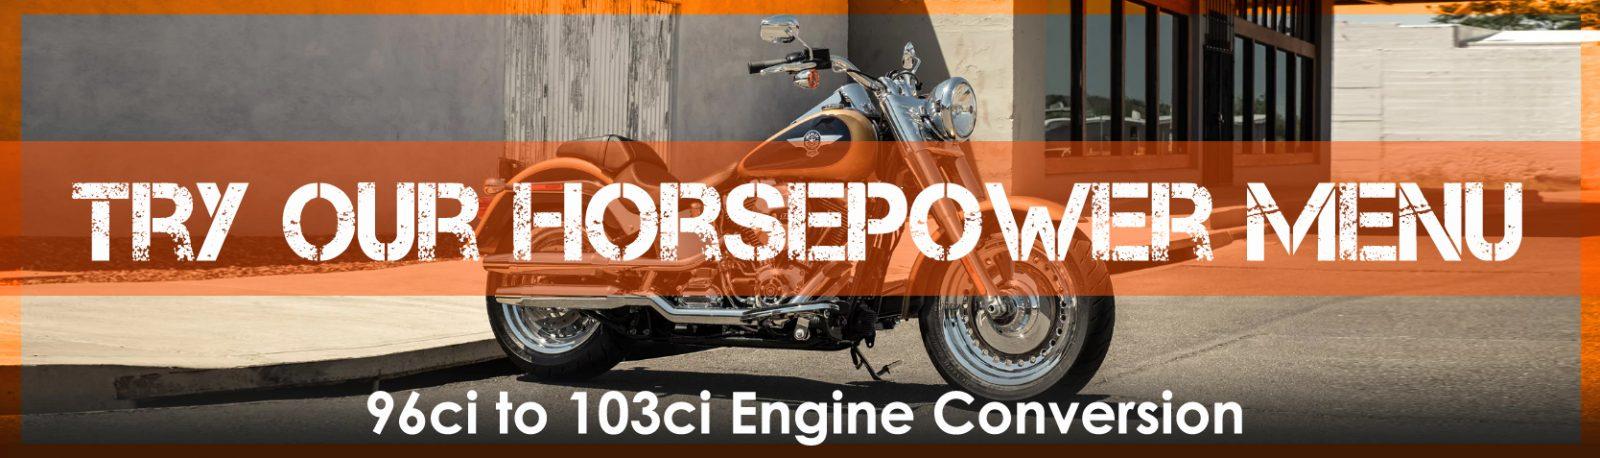 Horsepower menu